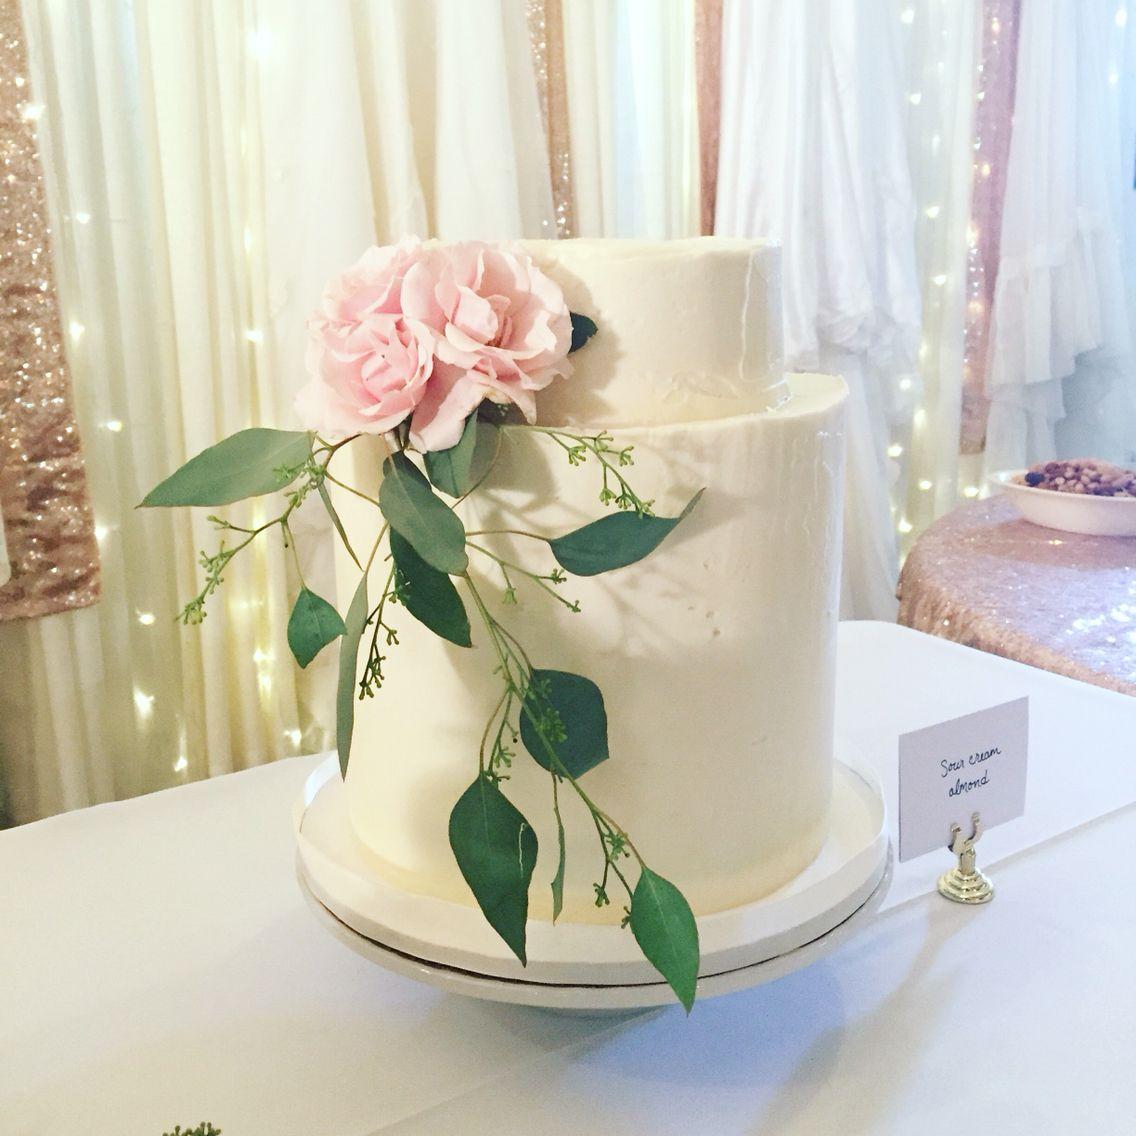 Double Barrel Buttercream Wedding Cake With Fresh Florals Flavor Sour Cream Vanilla